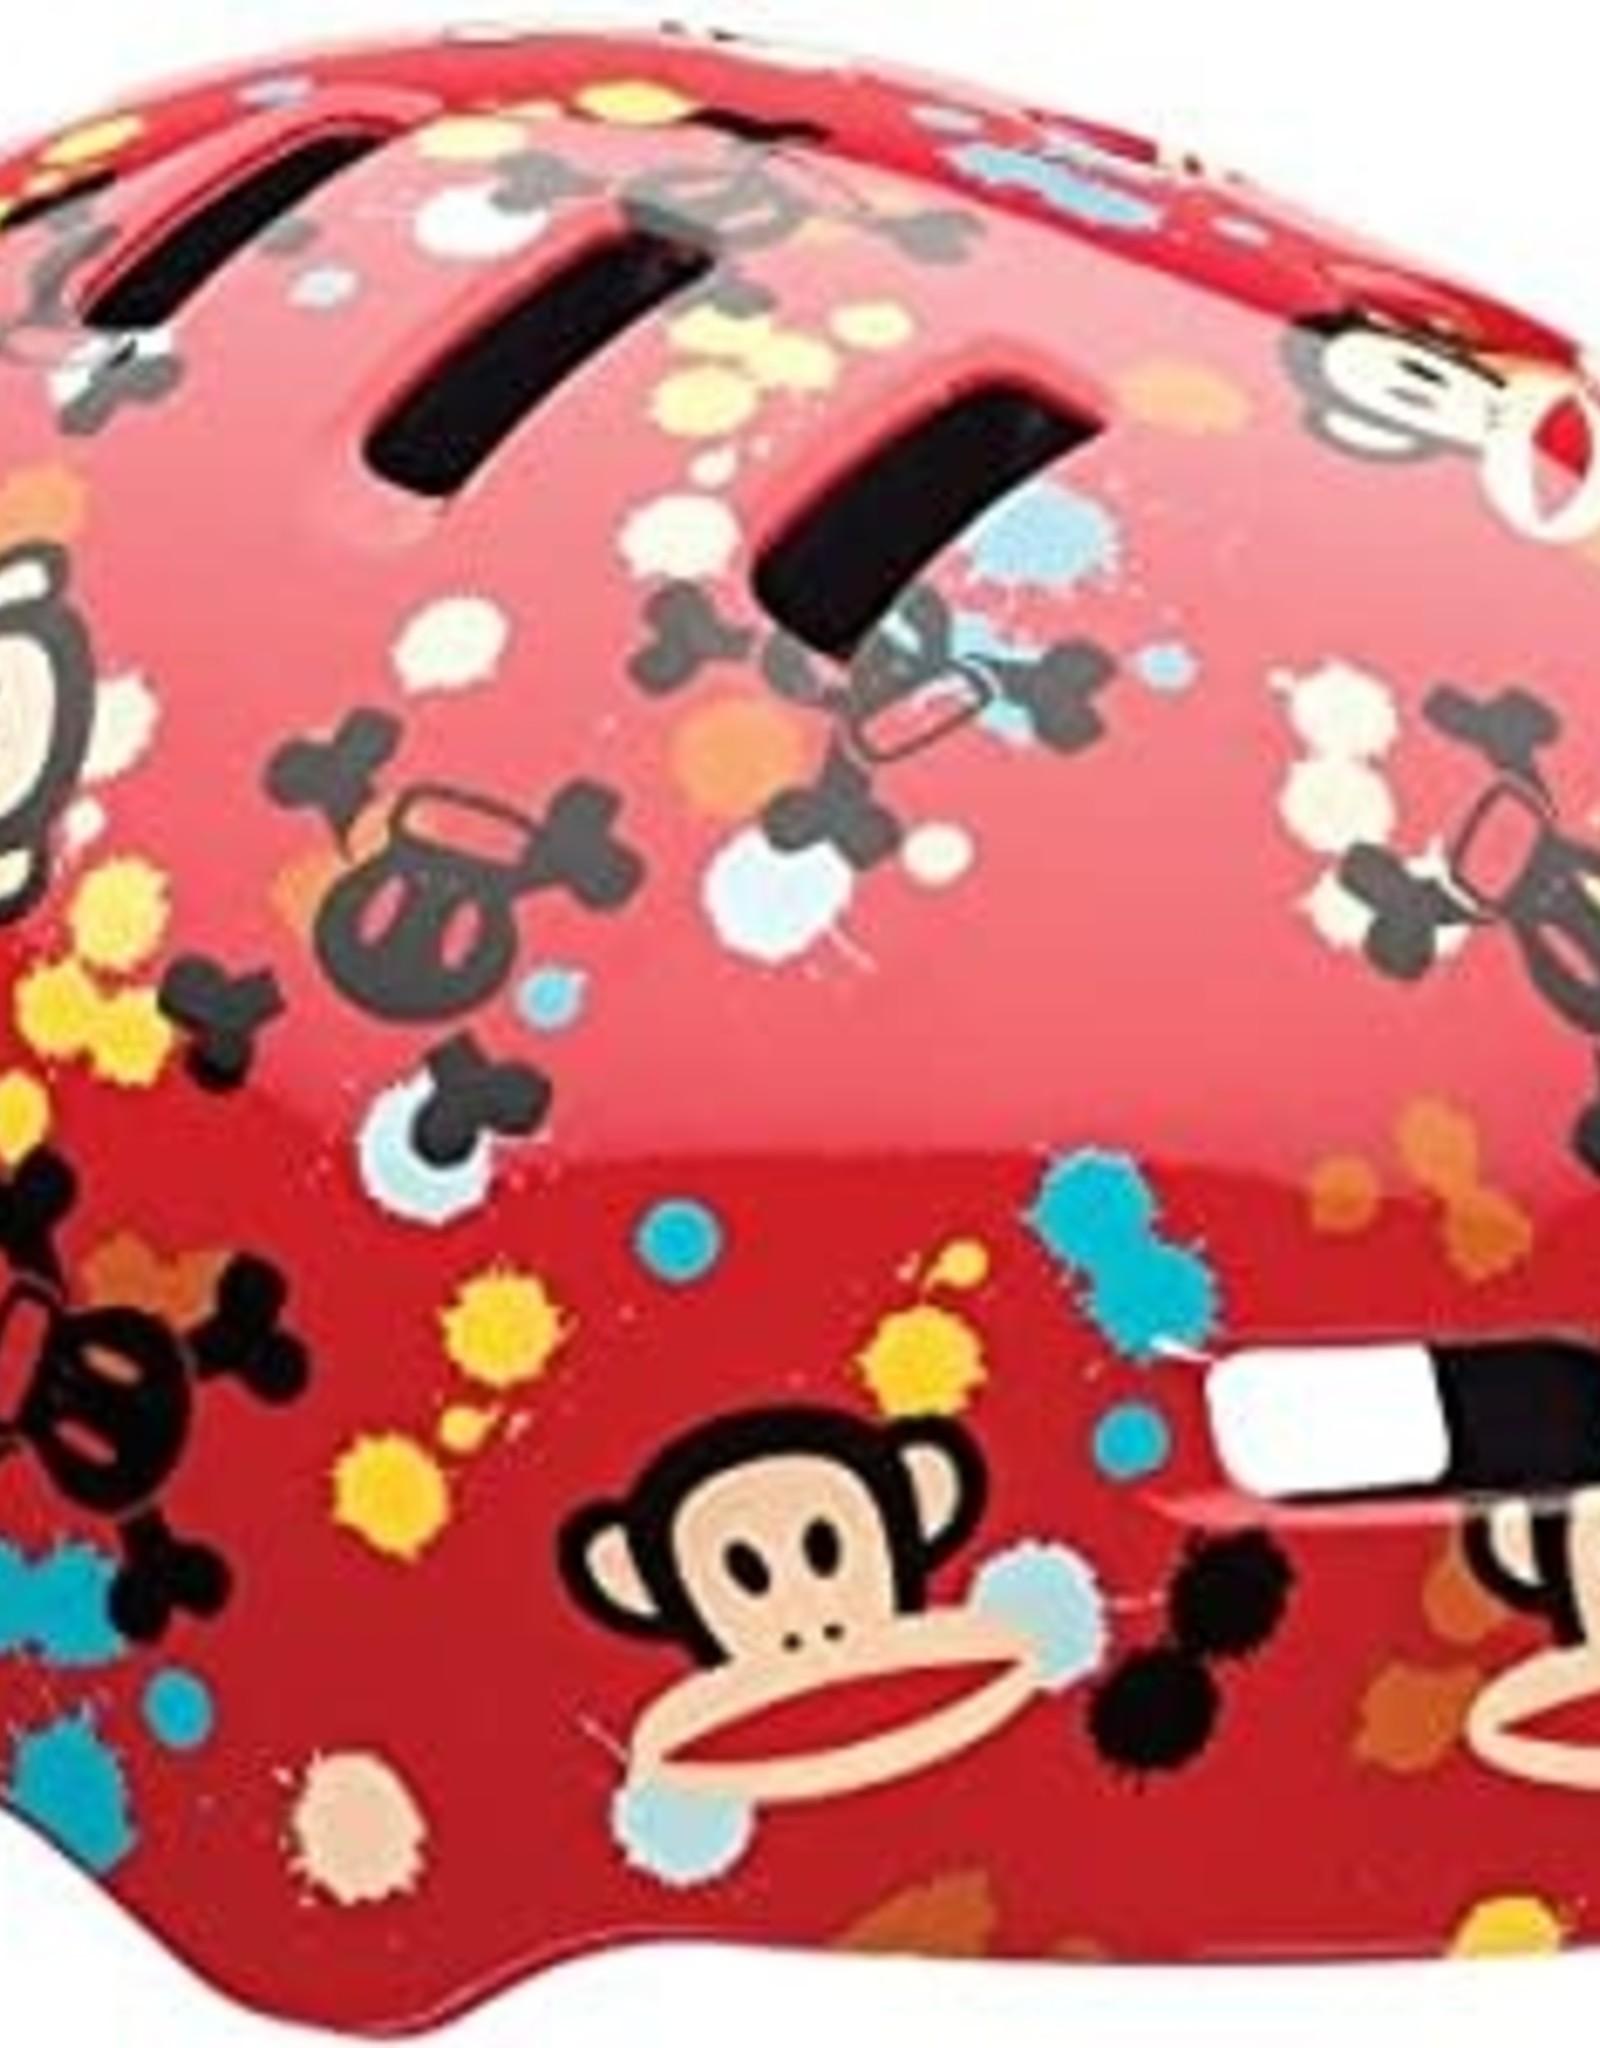 Bell Helmet - Casques FRACTION Red PF Paint Ball XS